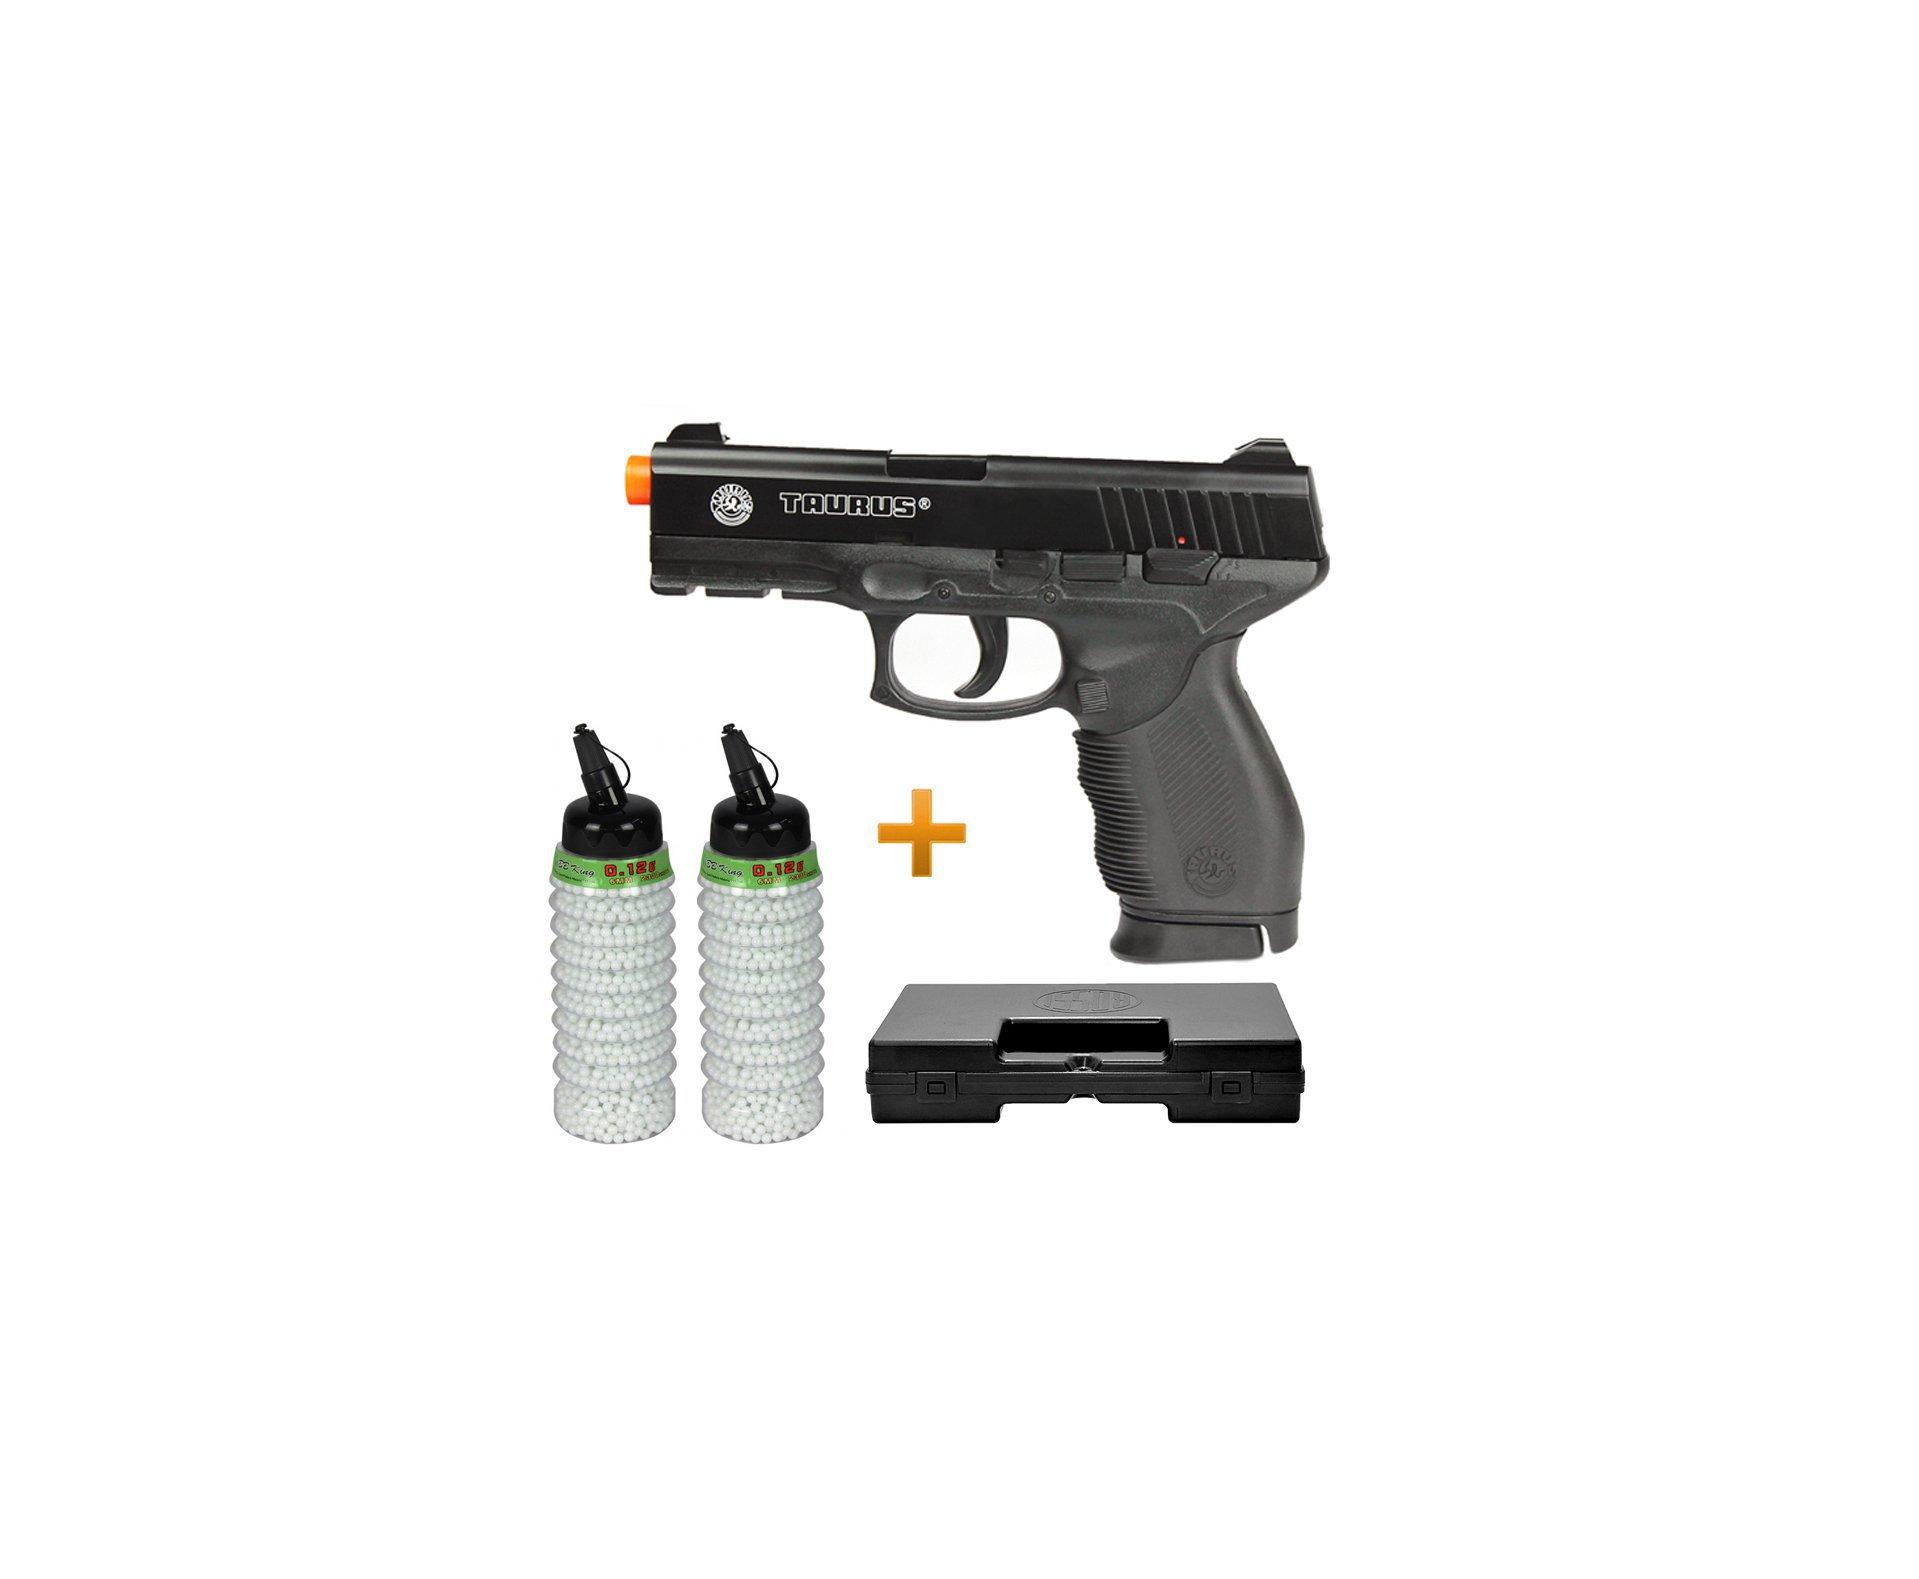 Pistola De Airsoft Taurus Pt 24/7 Semi/metal - Cal 6,0 Mm + 4000 Esferas 0,12g + Case Deluxe - Cybergun